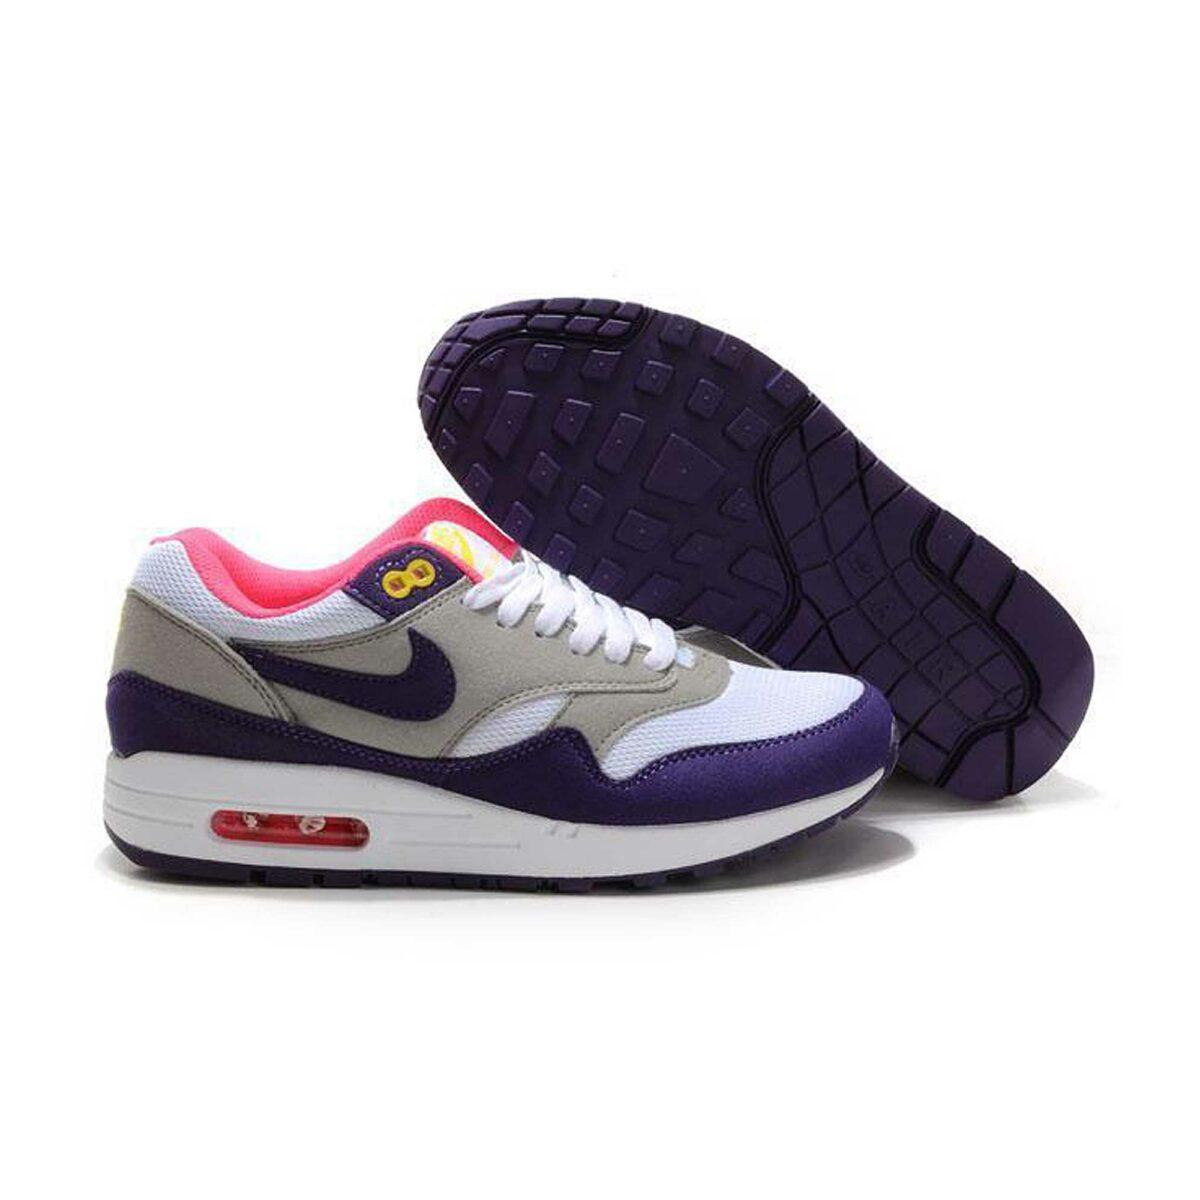 Интернет магазин Nike Air Max 1 87 Purple Grey